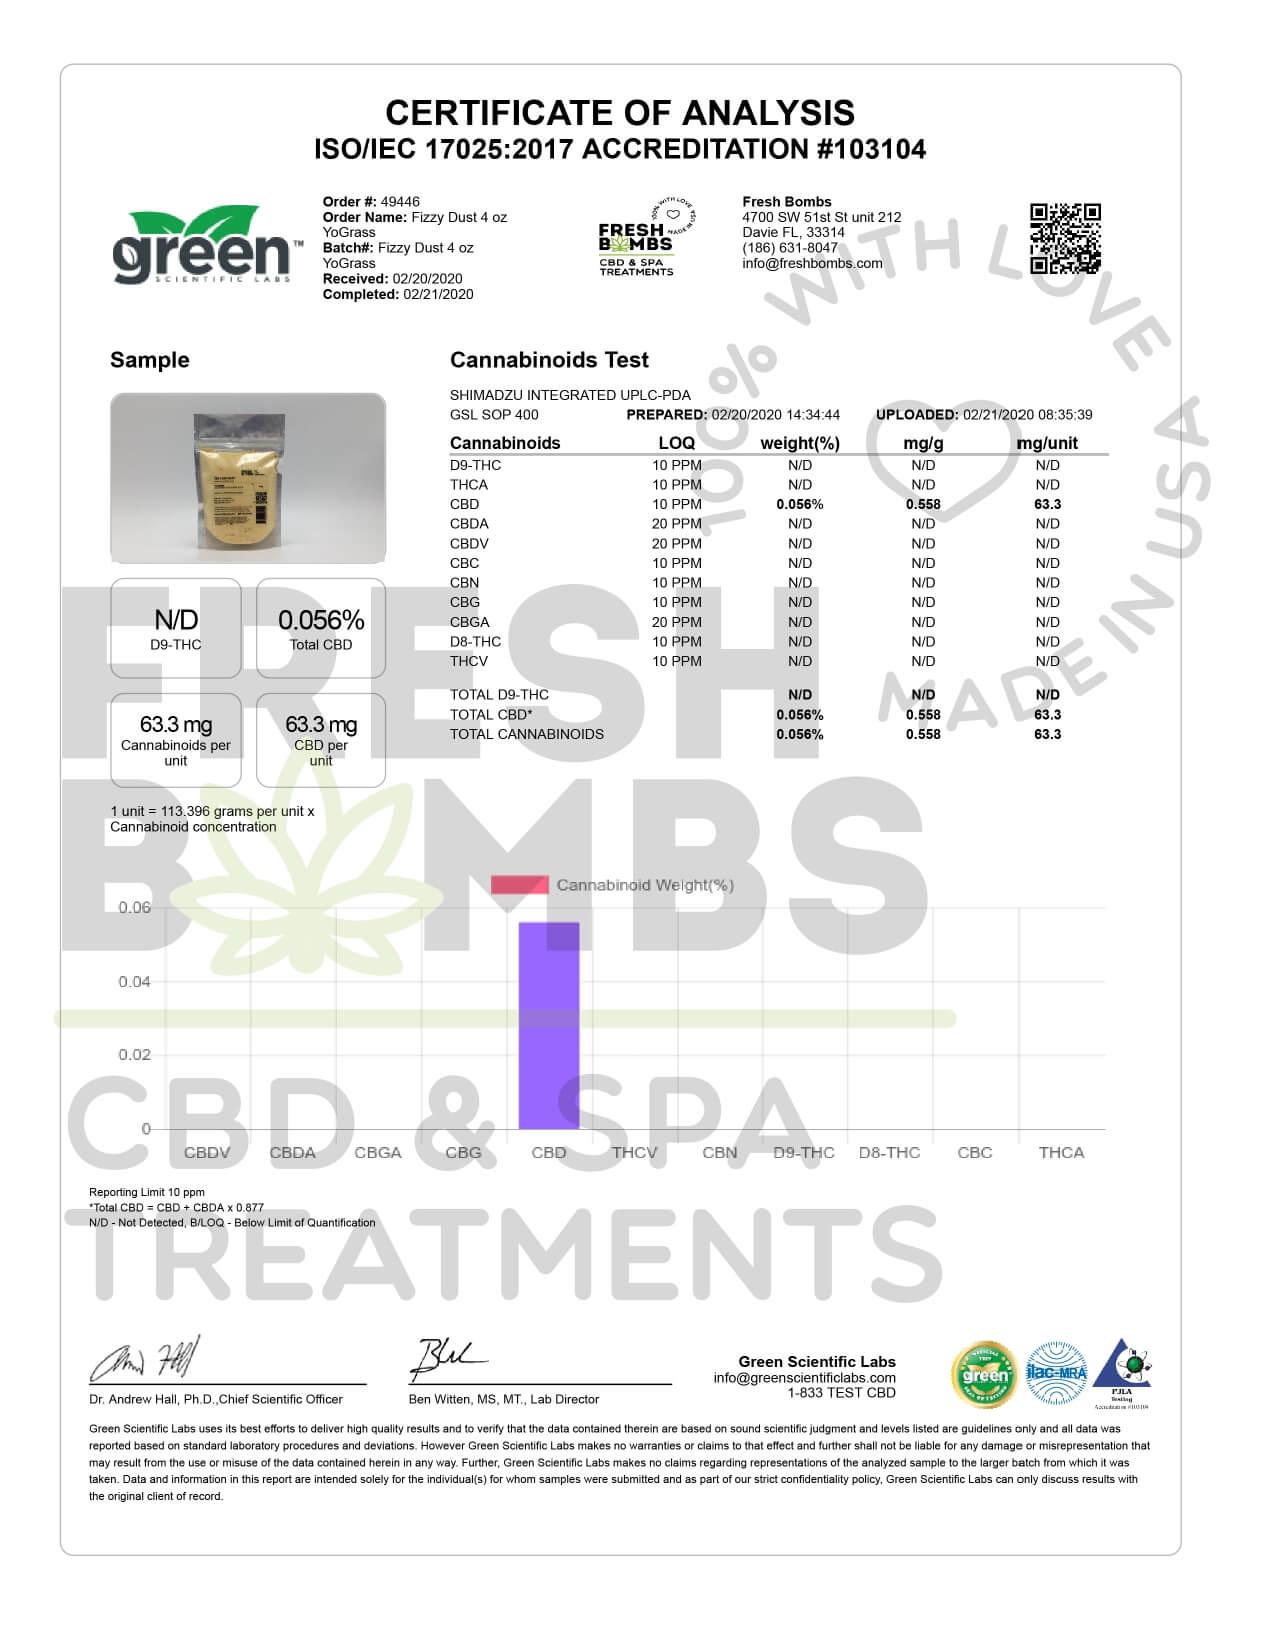 Fresh Bombs CBD Bath YoGrass Fizzy Dust 50mg Lab Report